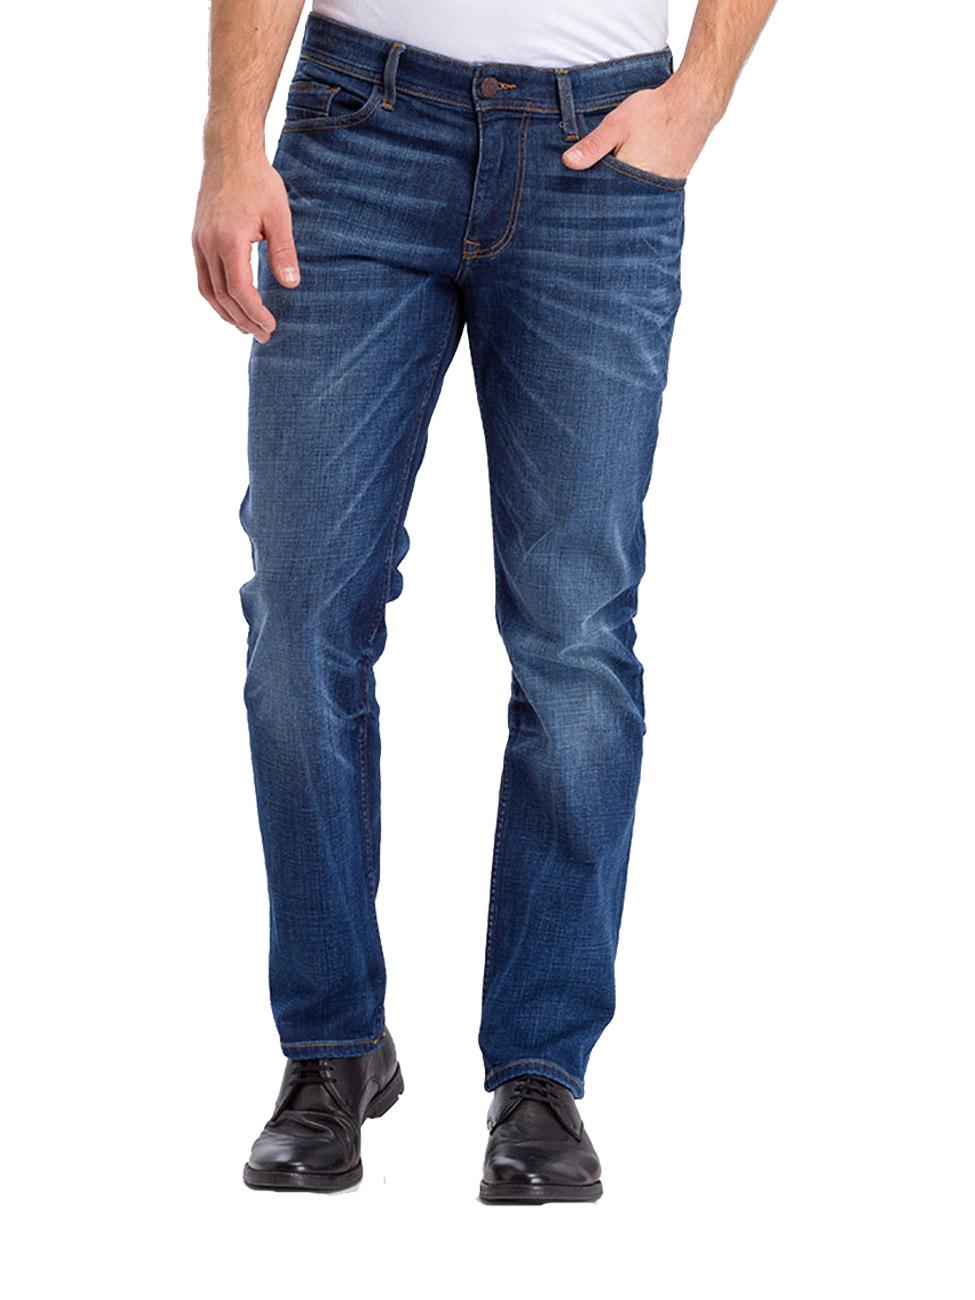 Cross Herren Jeans Antonio Relax Fit - Blau - Dark Mid Blue